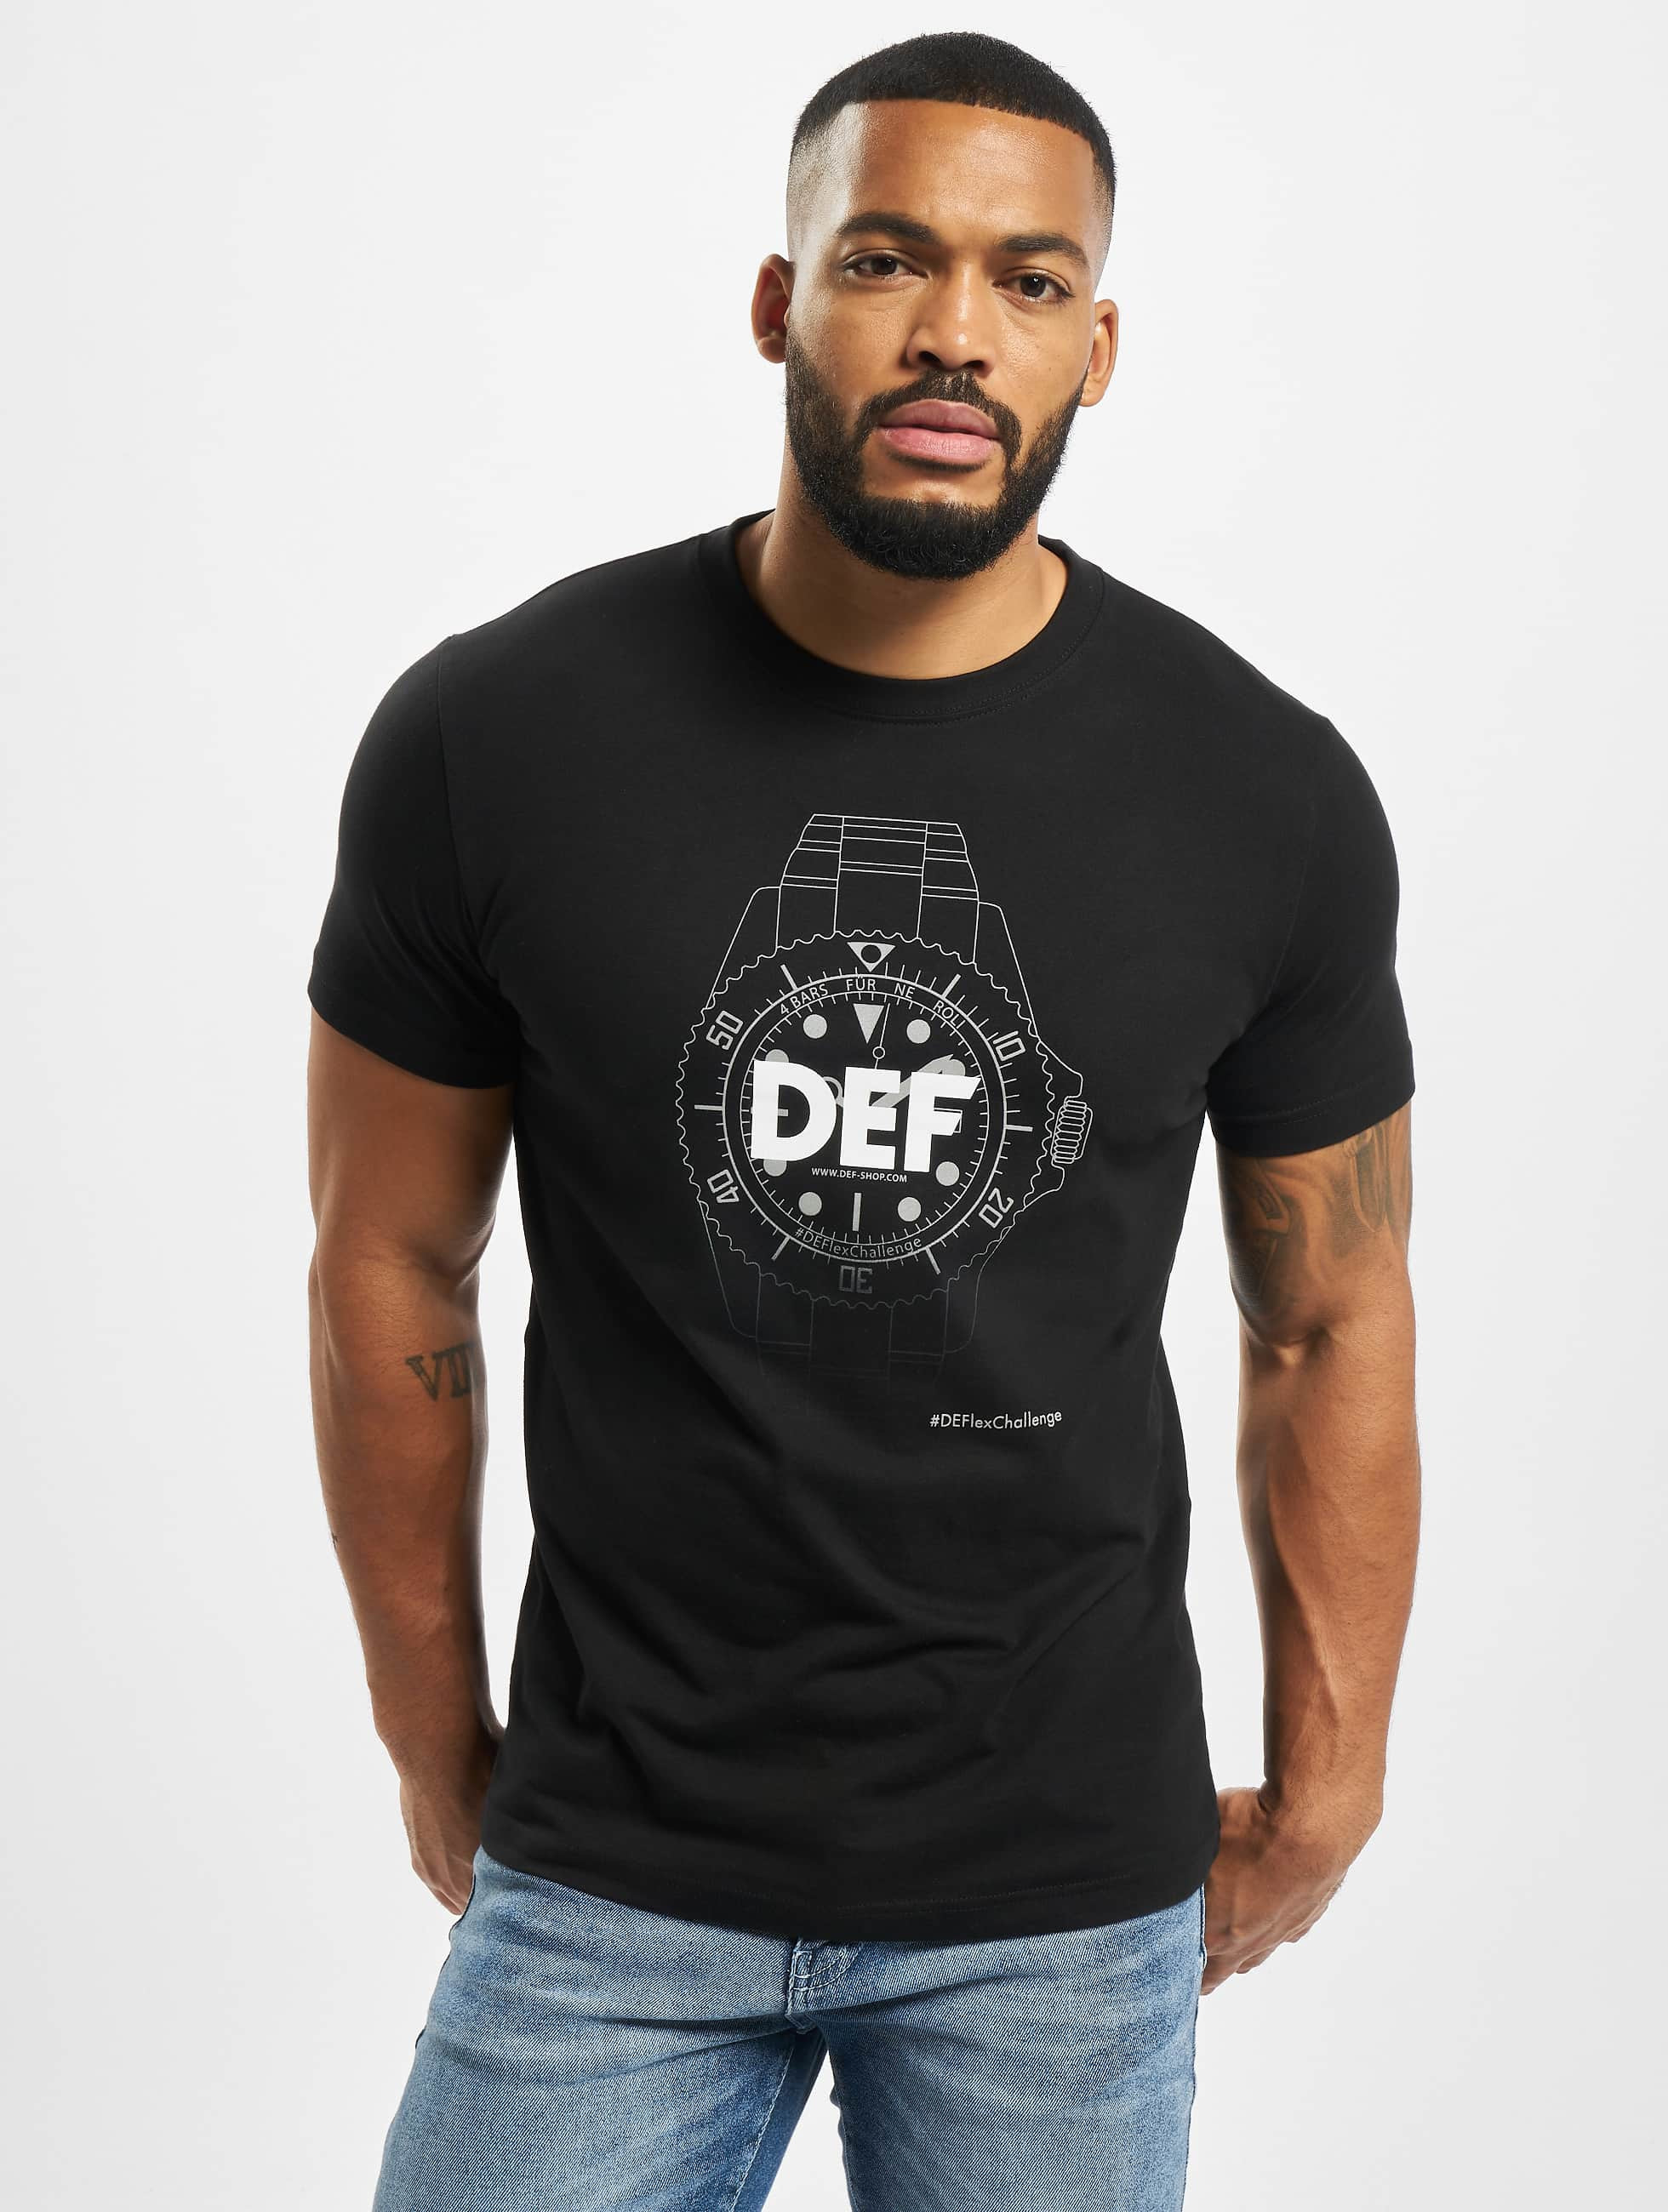 DEF / T-Shirt Roli in black 2XL